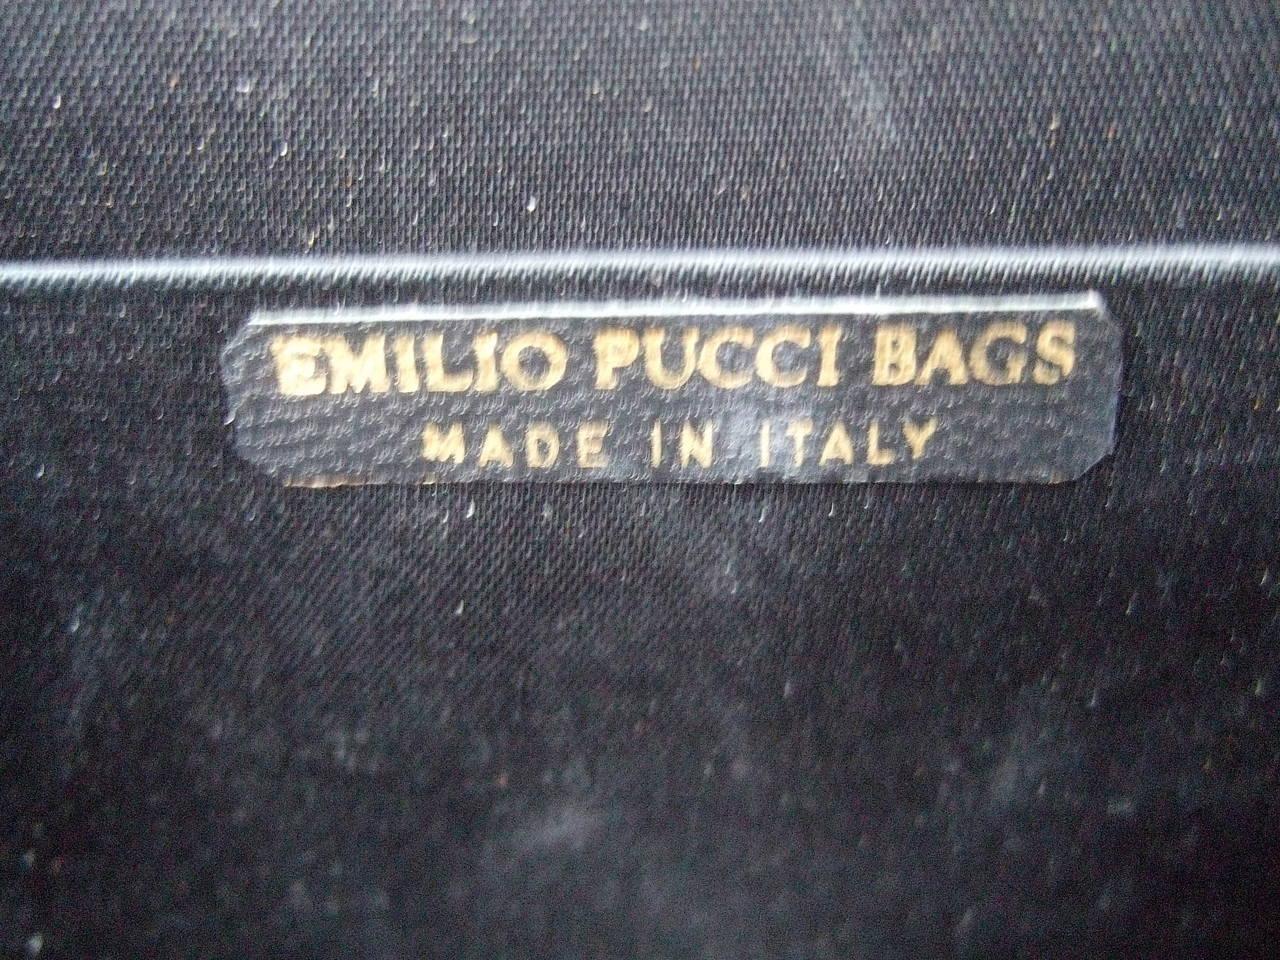 Emilio Pucci Italy Silk Diminutive Envelope Style Handbag c 1970 For Sale 2